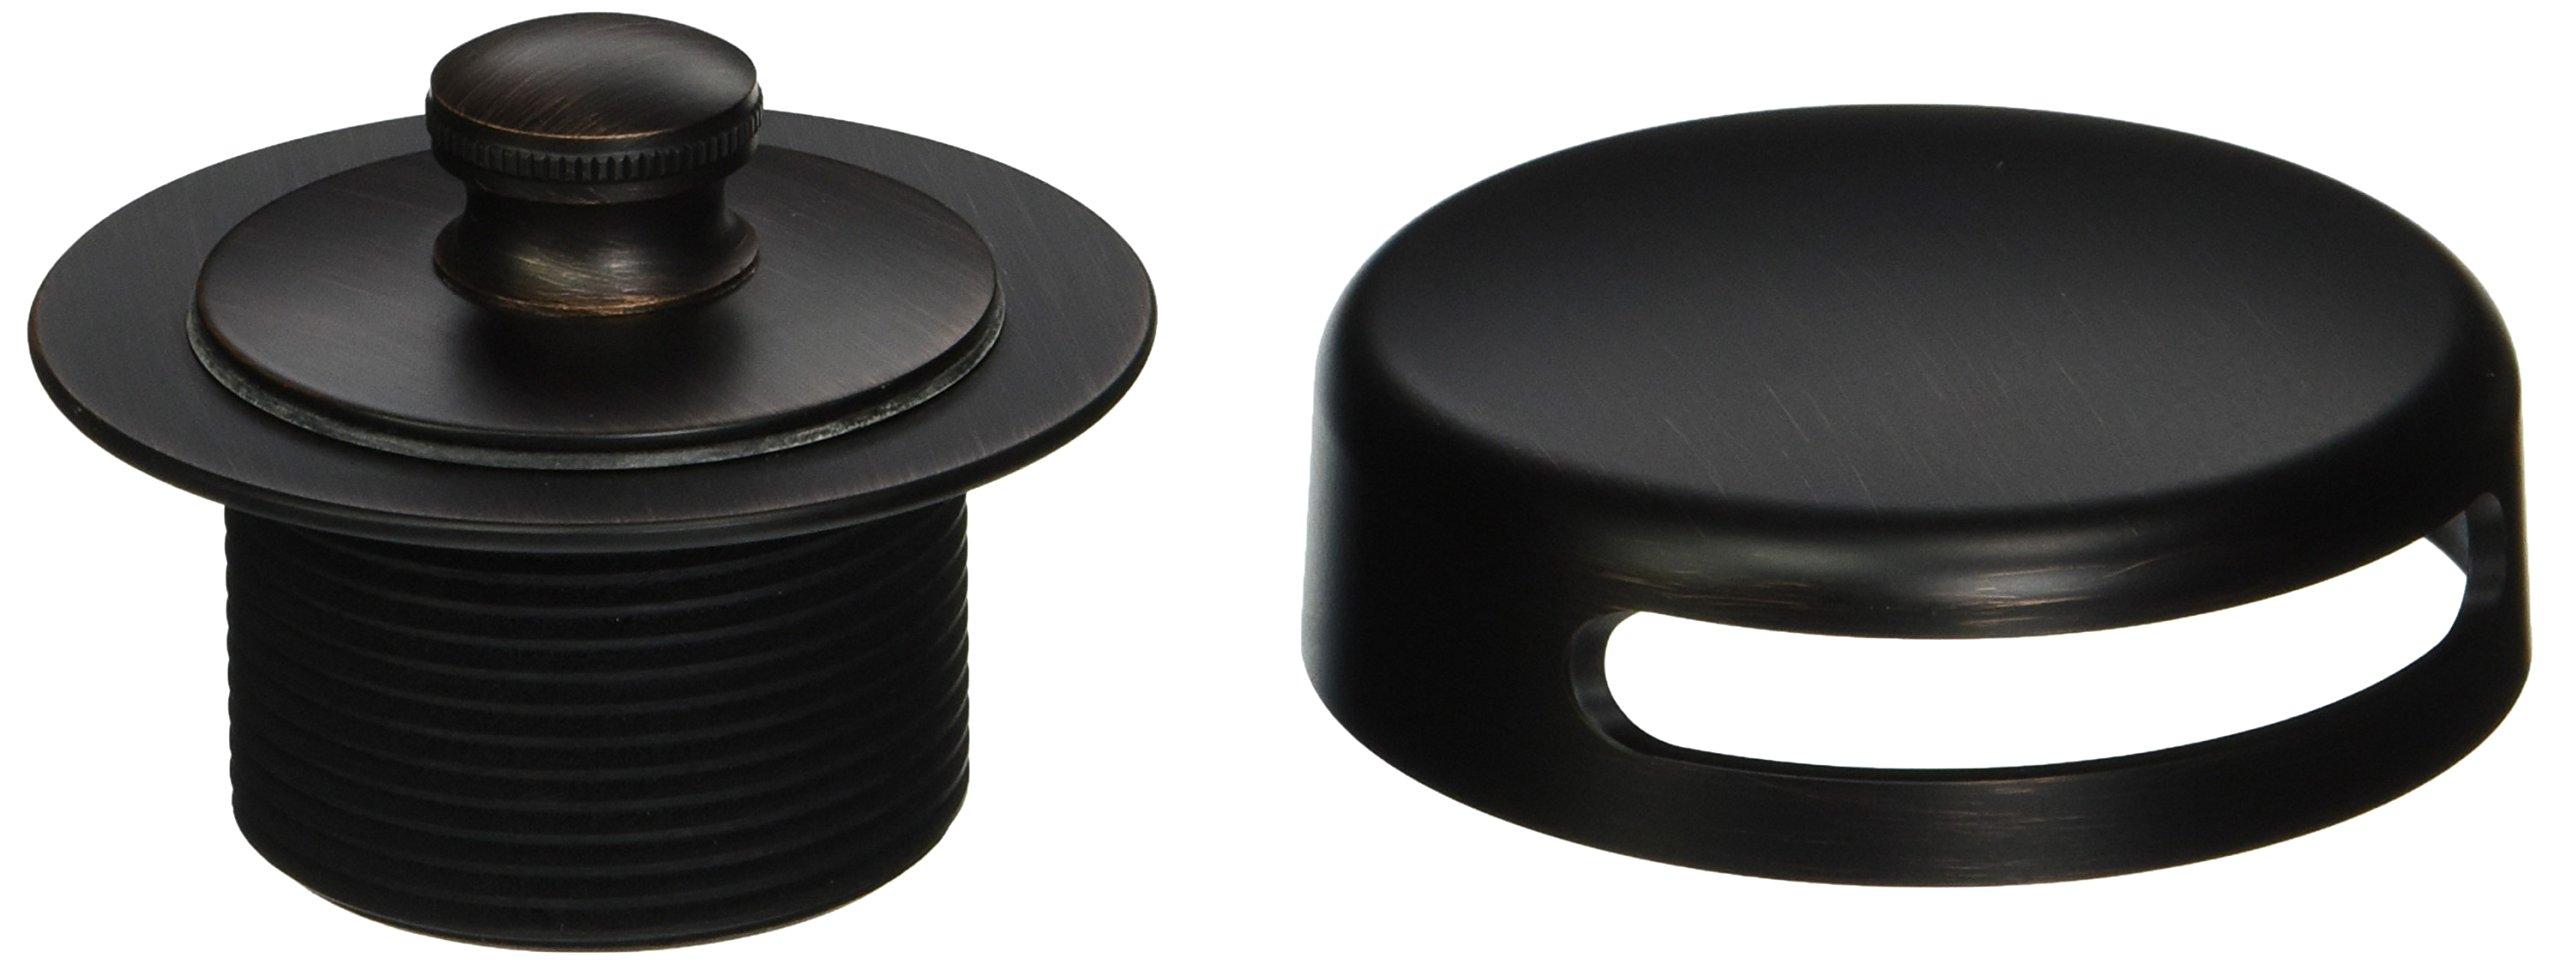 Watco Manufacturing 938290-BZ Innovator Push Pull Trim Kit, Oil Rubbed Bronze